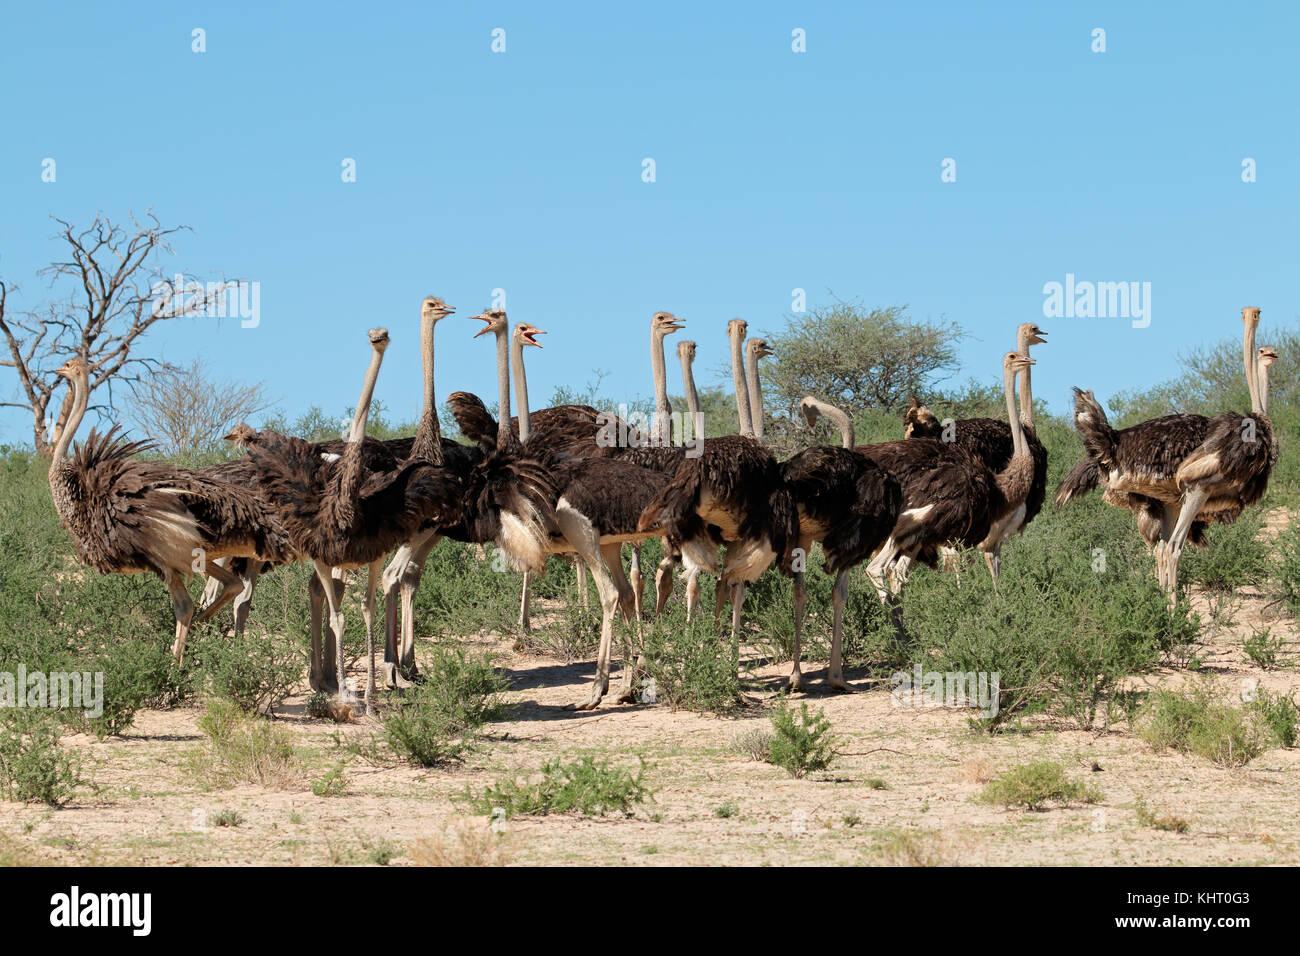 Grupo de avestruces (Struthio camelus) en su hábitat natural, el desierto de Kalahari, Sudáfrica Imagen De Stock